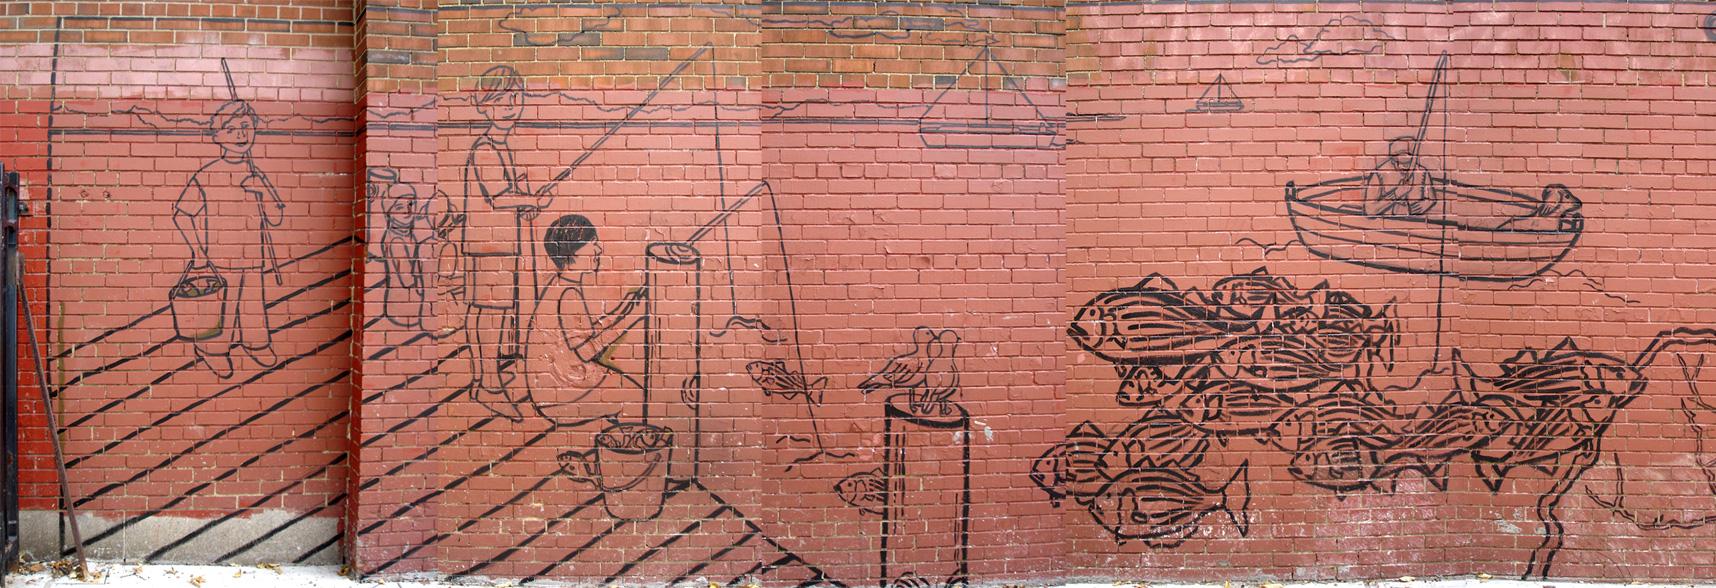 mural-ps52-2-3.jpg